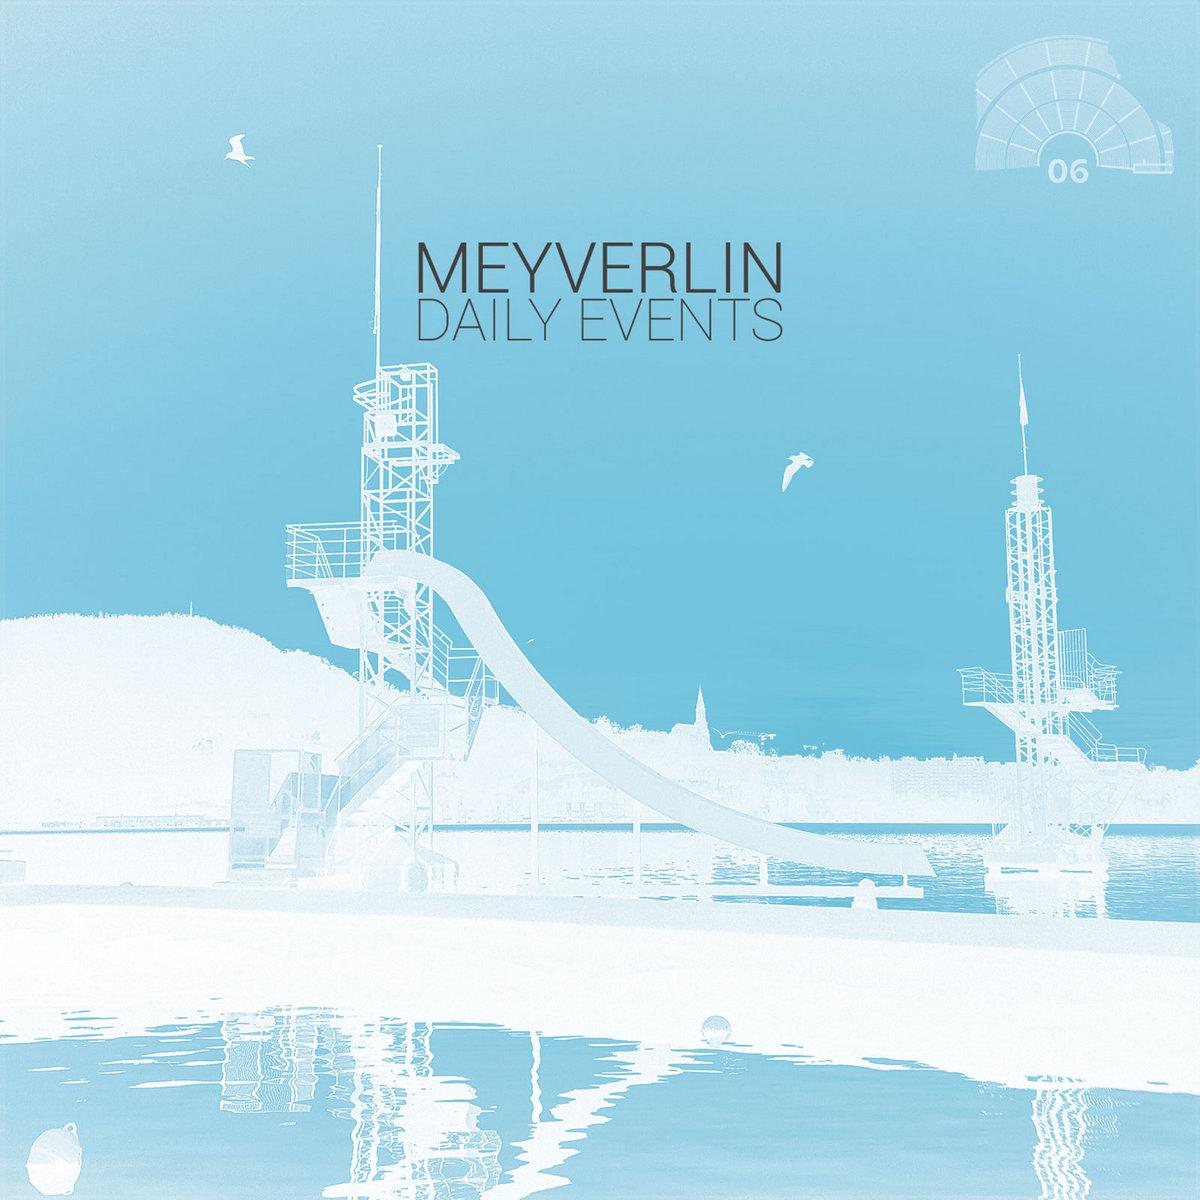 Focus Découverte – Meyverlin